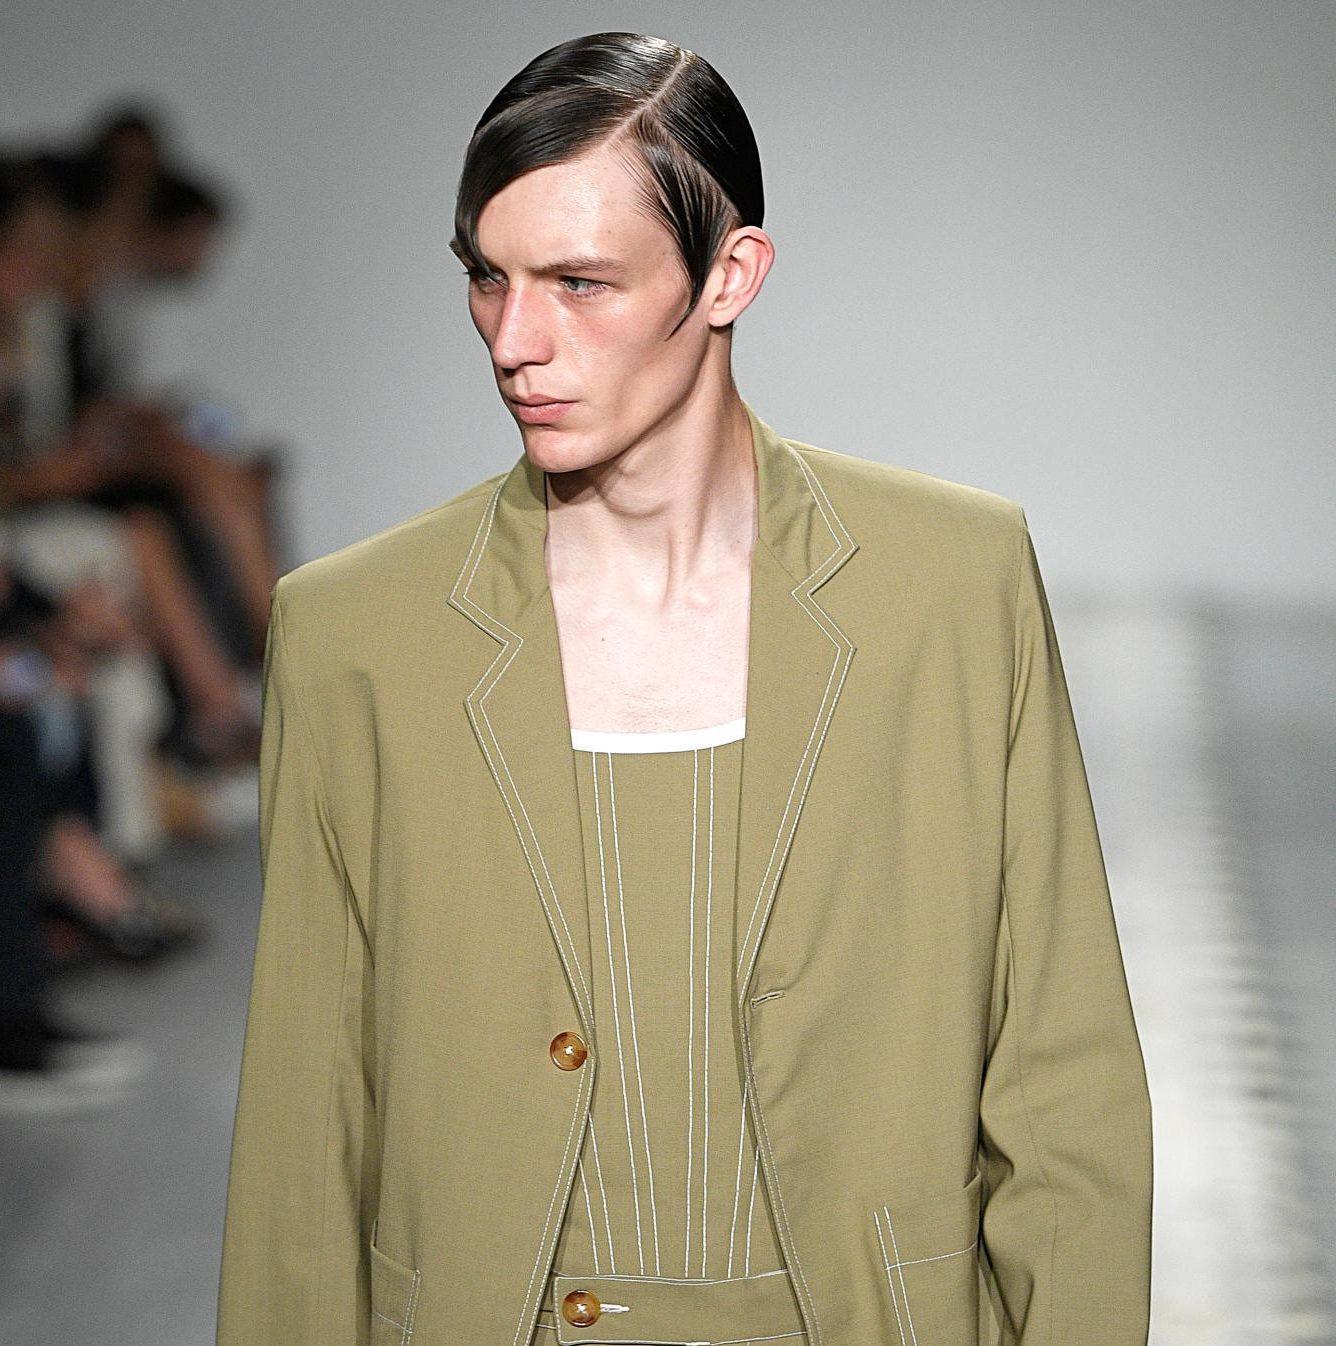 riscos no cabelo masculino